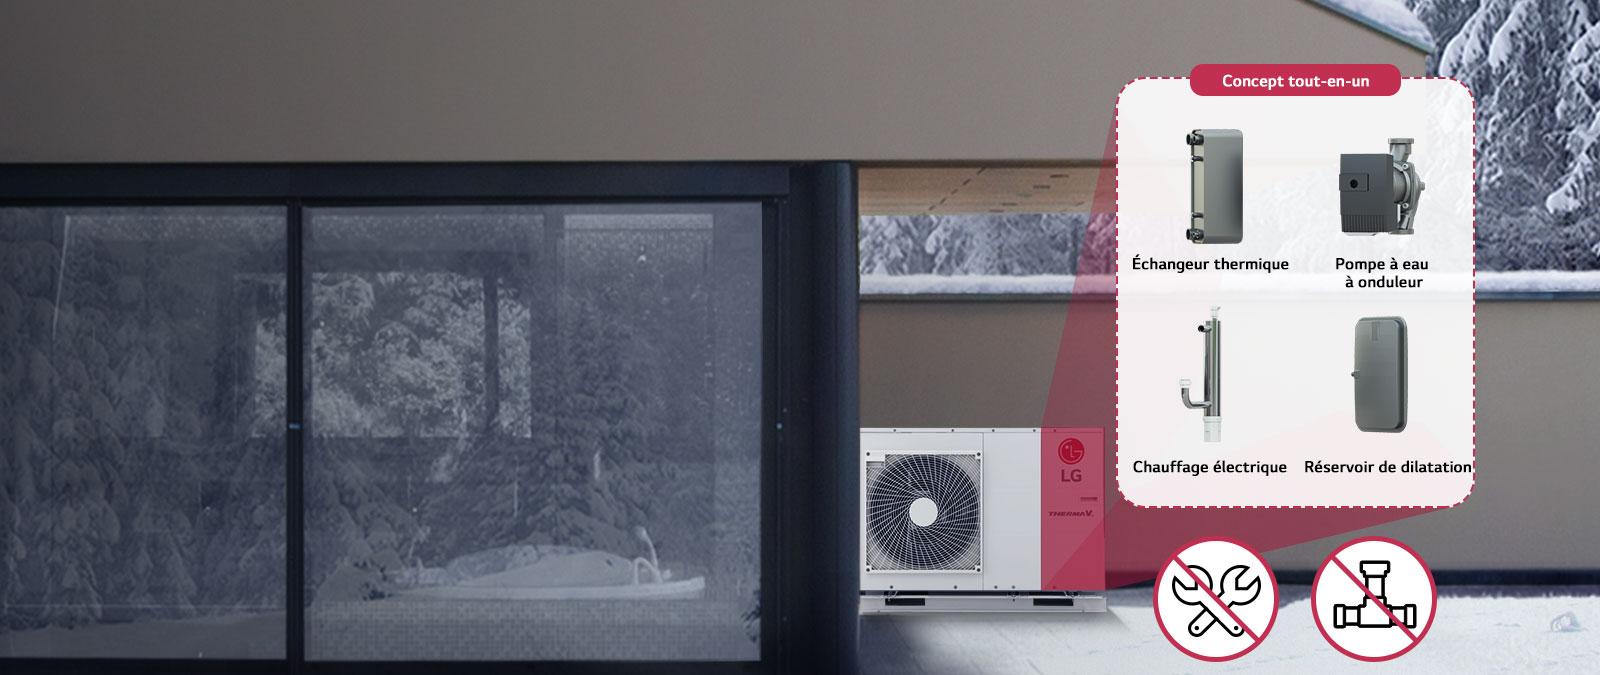 lg hm051m pompe chaleur lg suisse. Black Bedroom Furniture Sets. Home Design Ideas